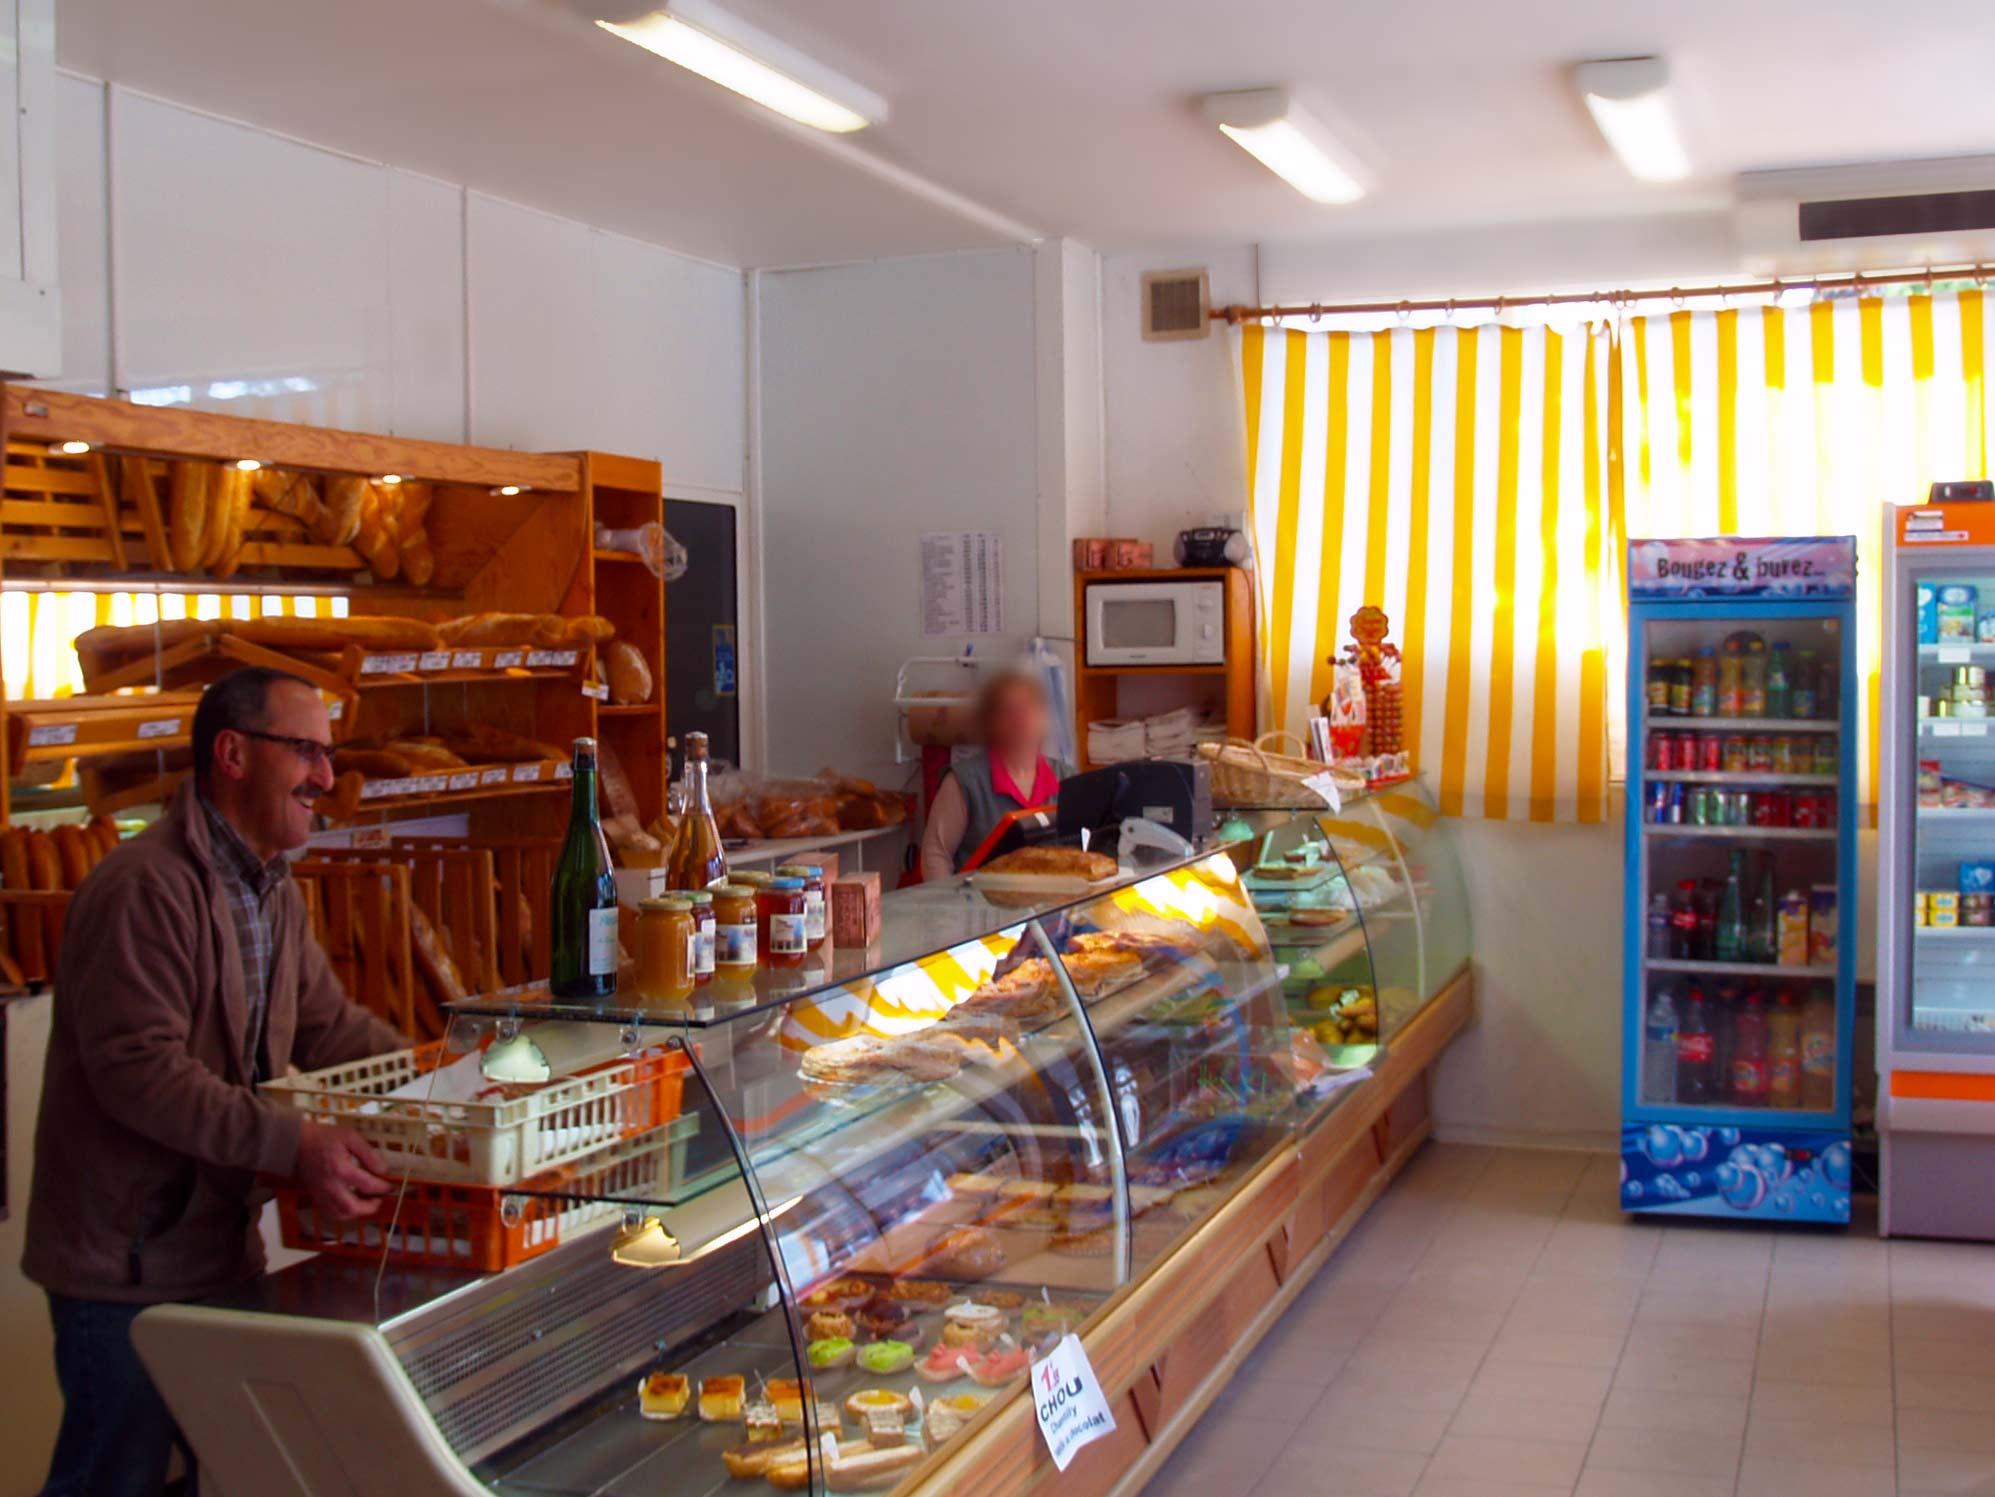 patisserie boulangerie laboutarie interieur